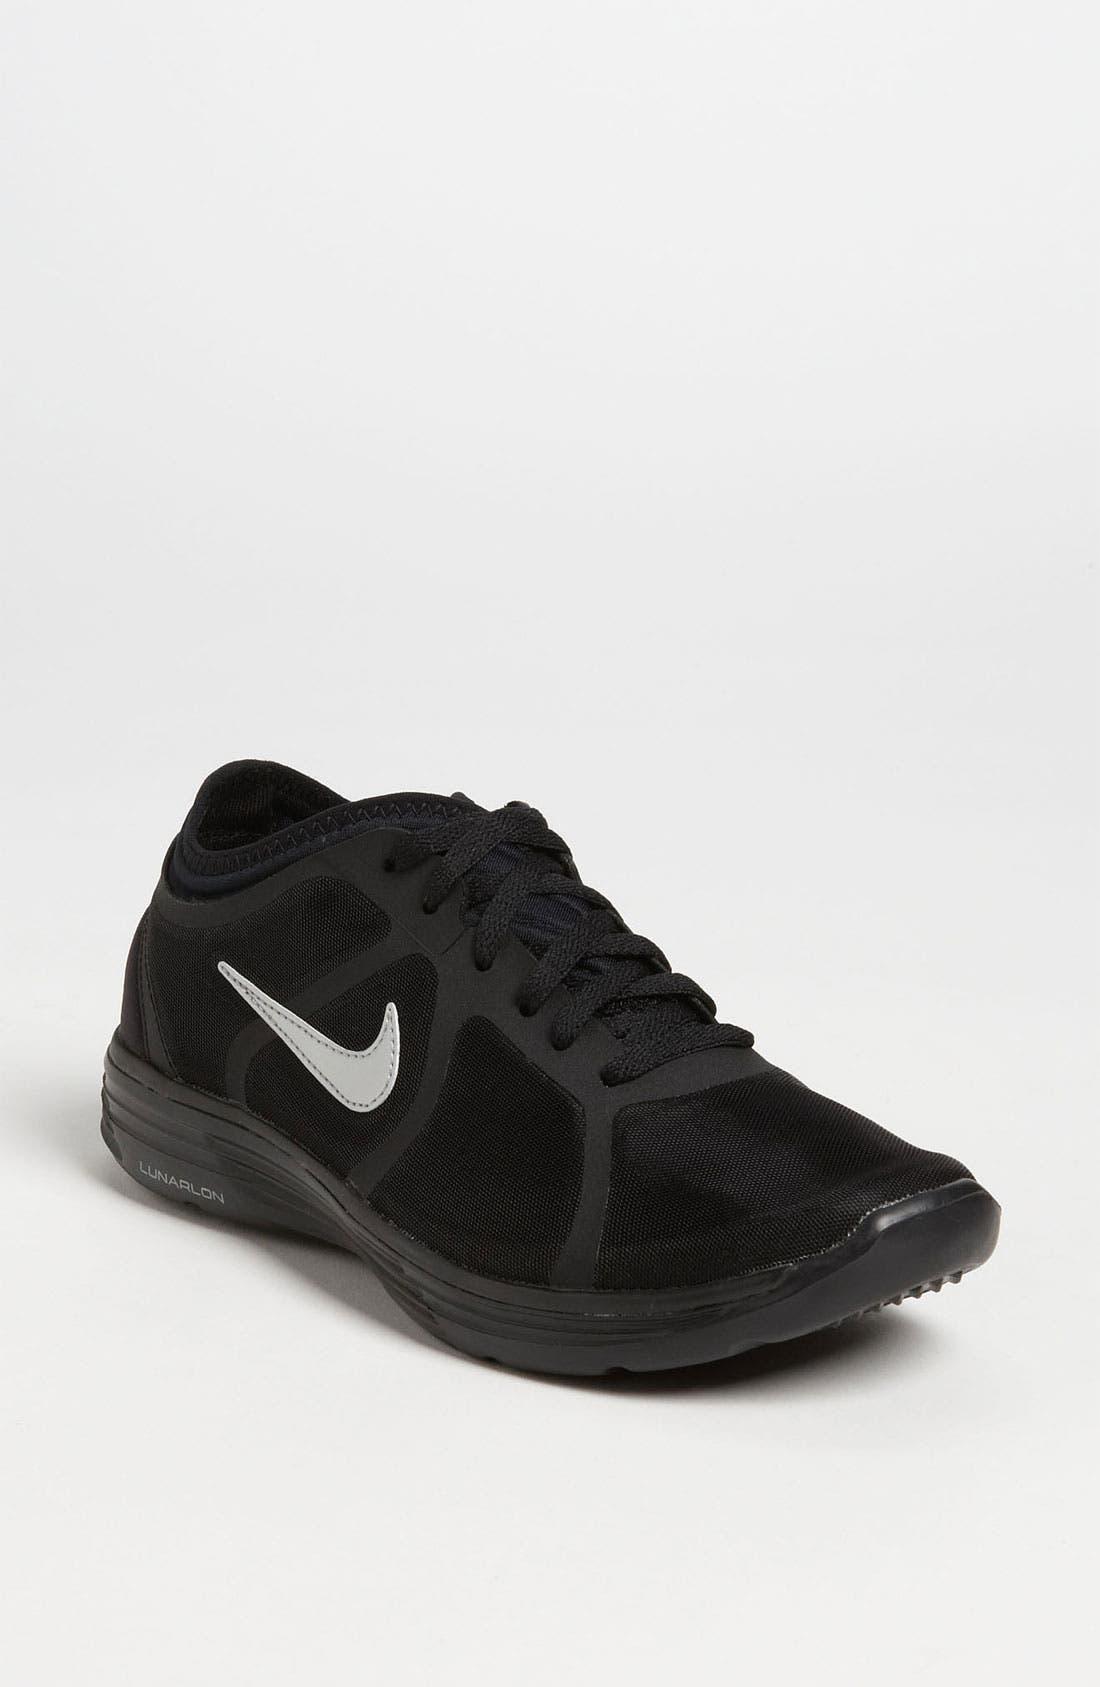 Main Image - Nike 'Lunarbase' Training Shoe (Women)